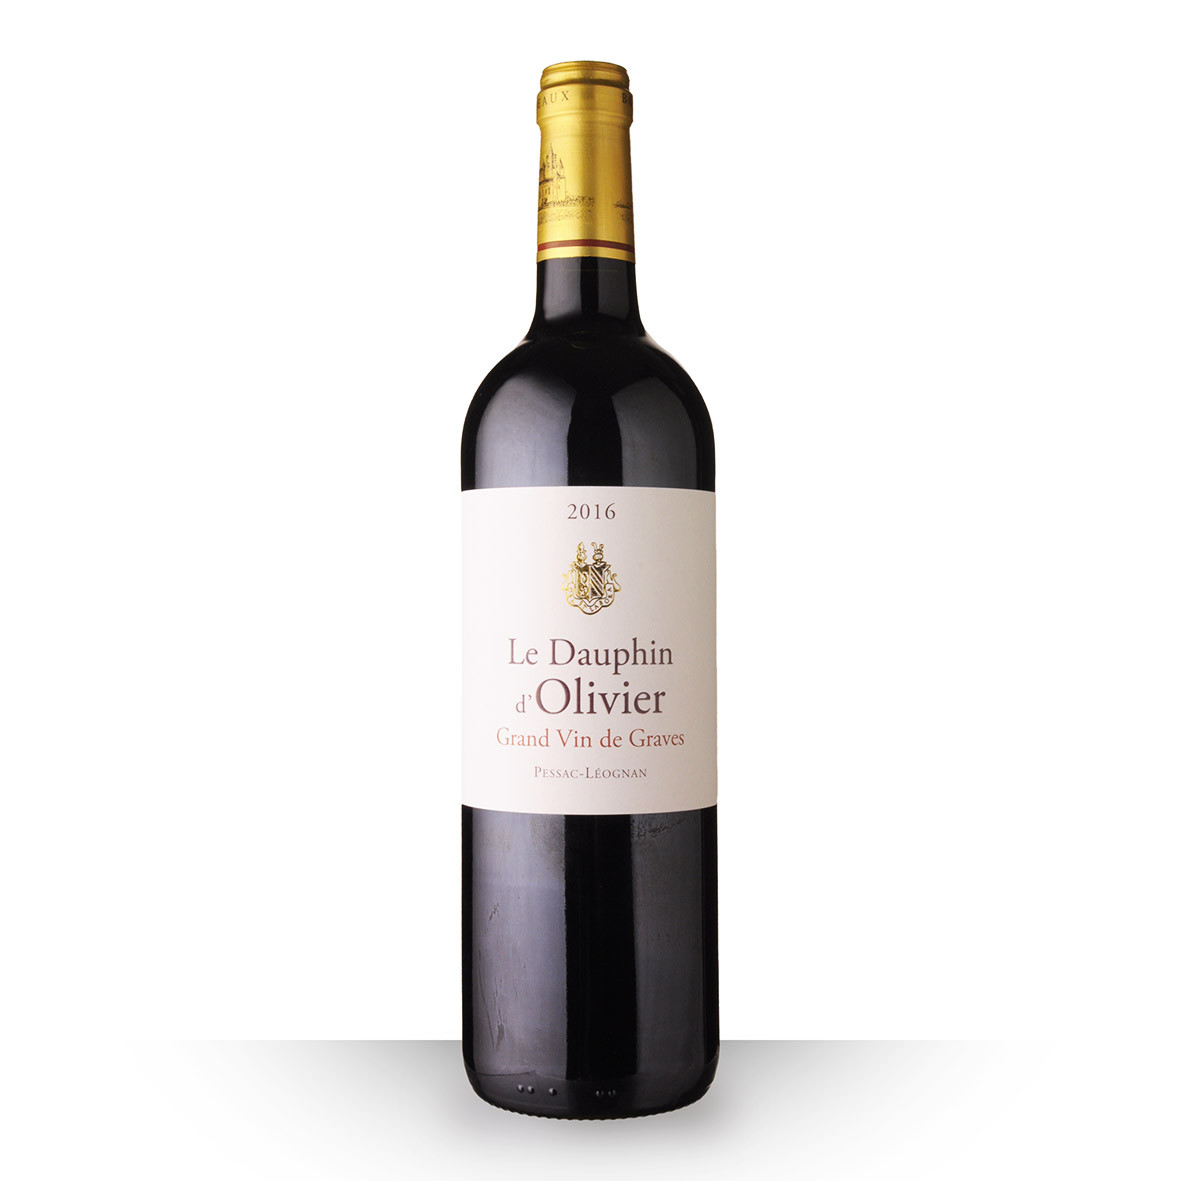 Le Dauphin dOlivier Pessac-Léognan Rouge 2016 75cl www.odyssee-vins.com